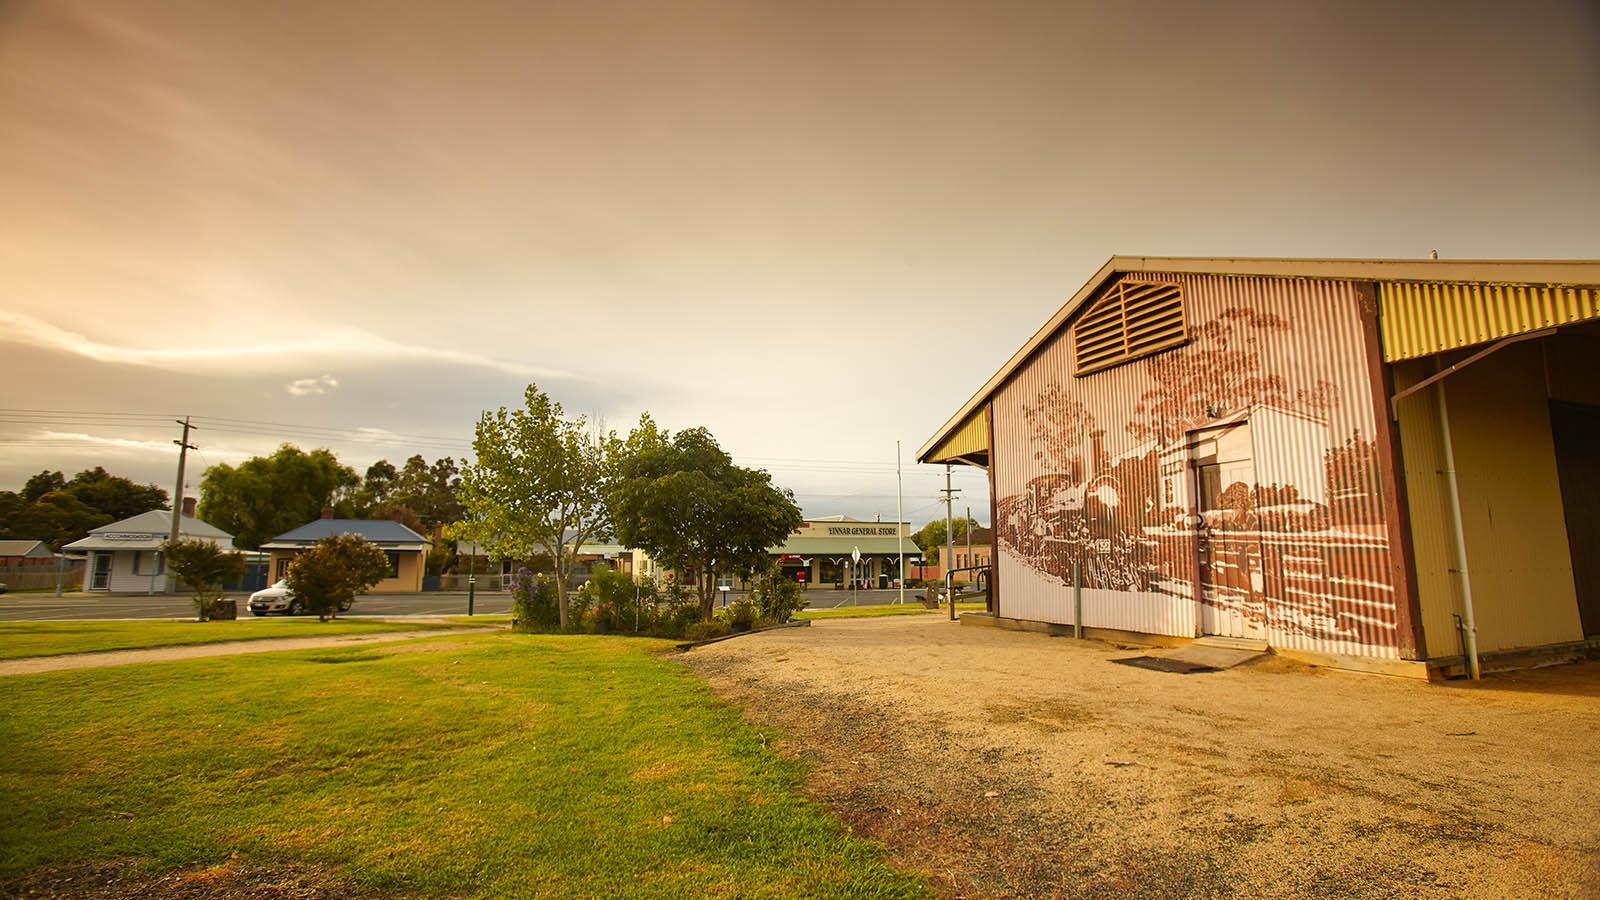 Yinnar, Gippsland, Victoria, Australia